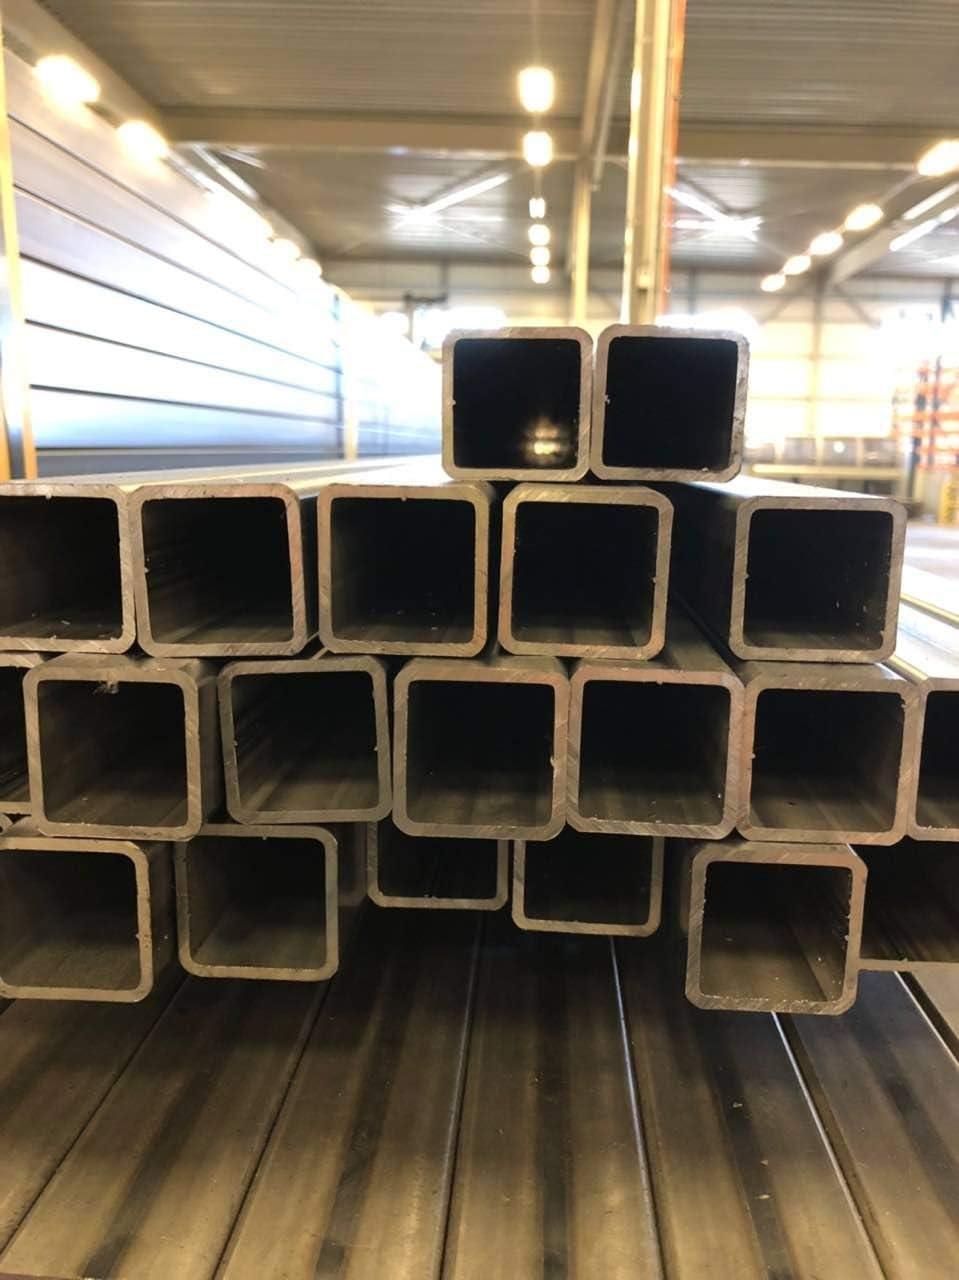 di/ámetro 40 x 25 x 2 hasta 100 x 100 x 3 St33 Tubo cuadrado de acero perfil hueco